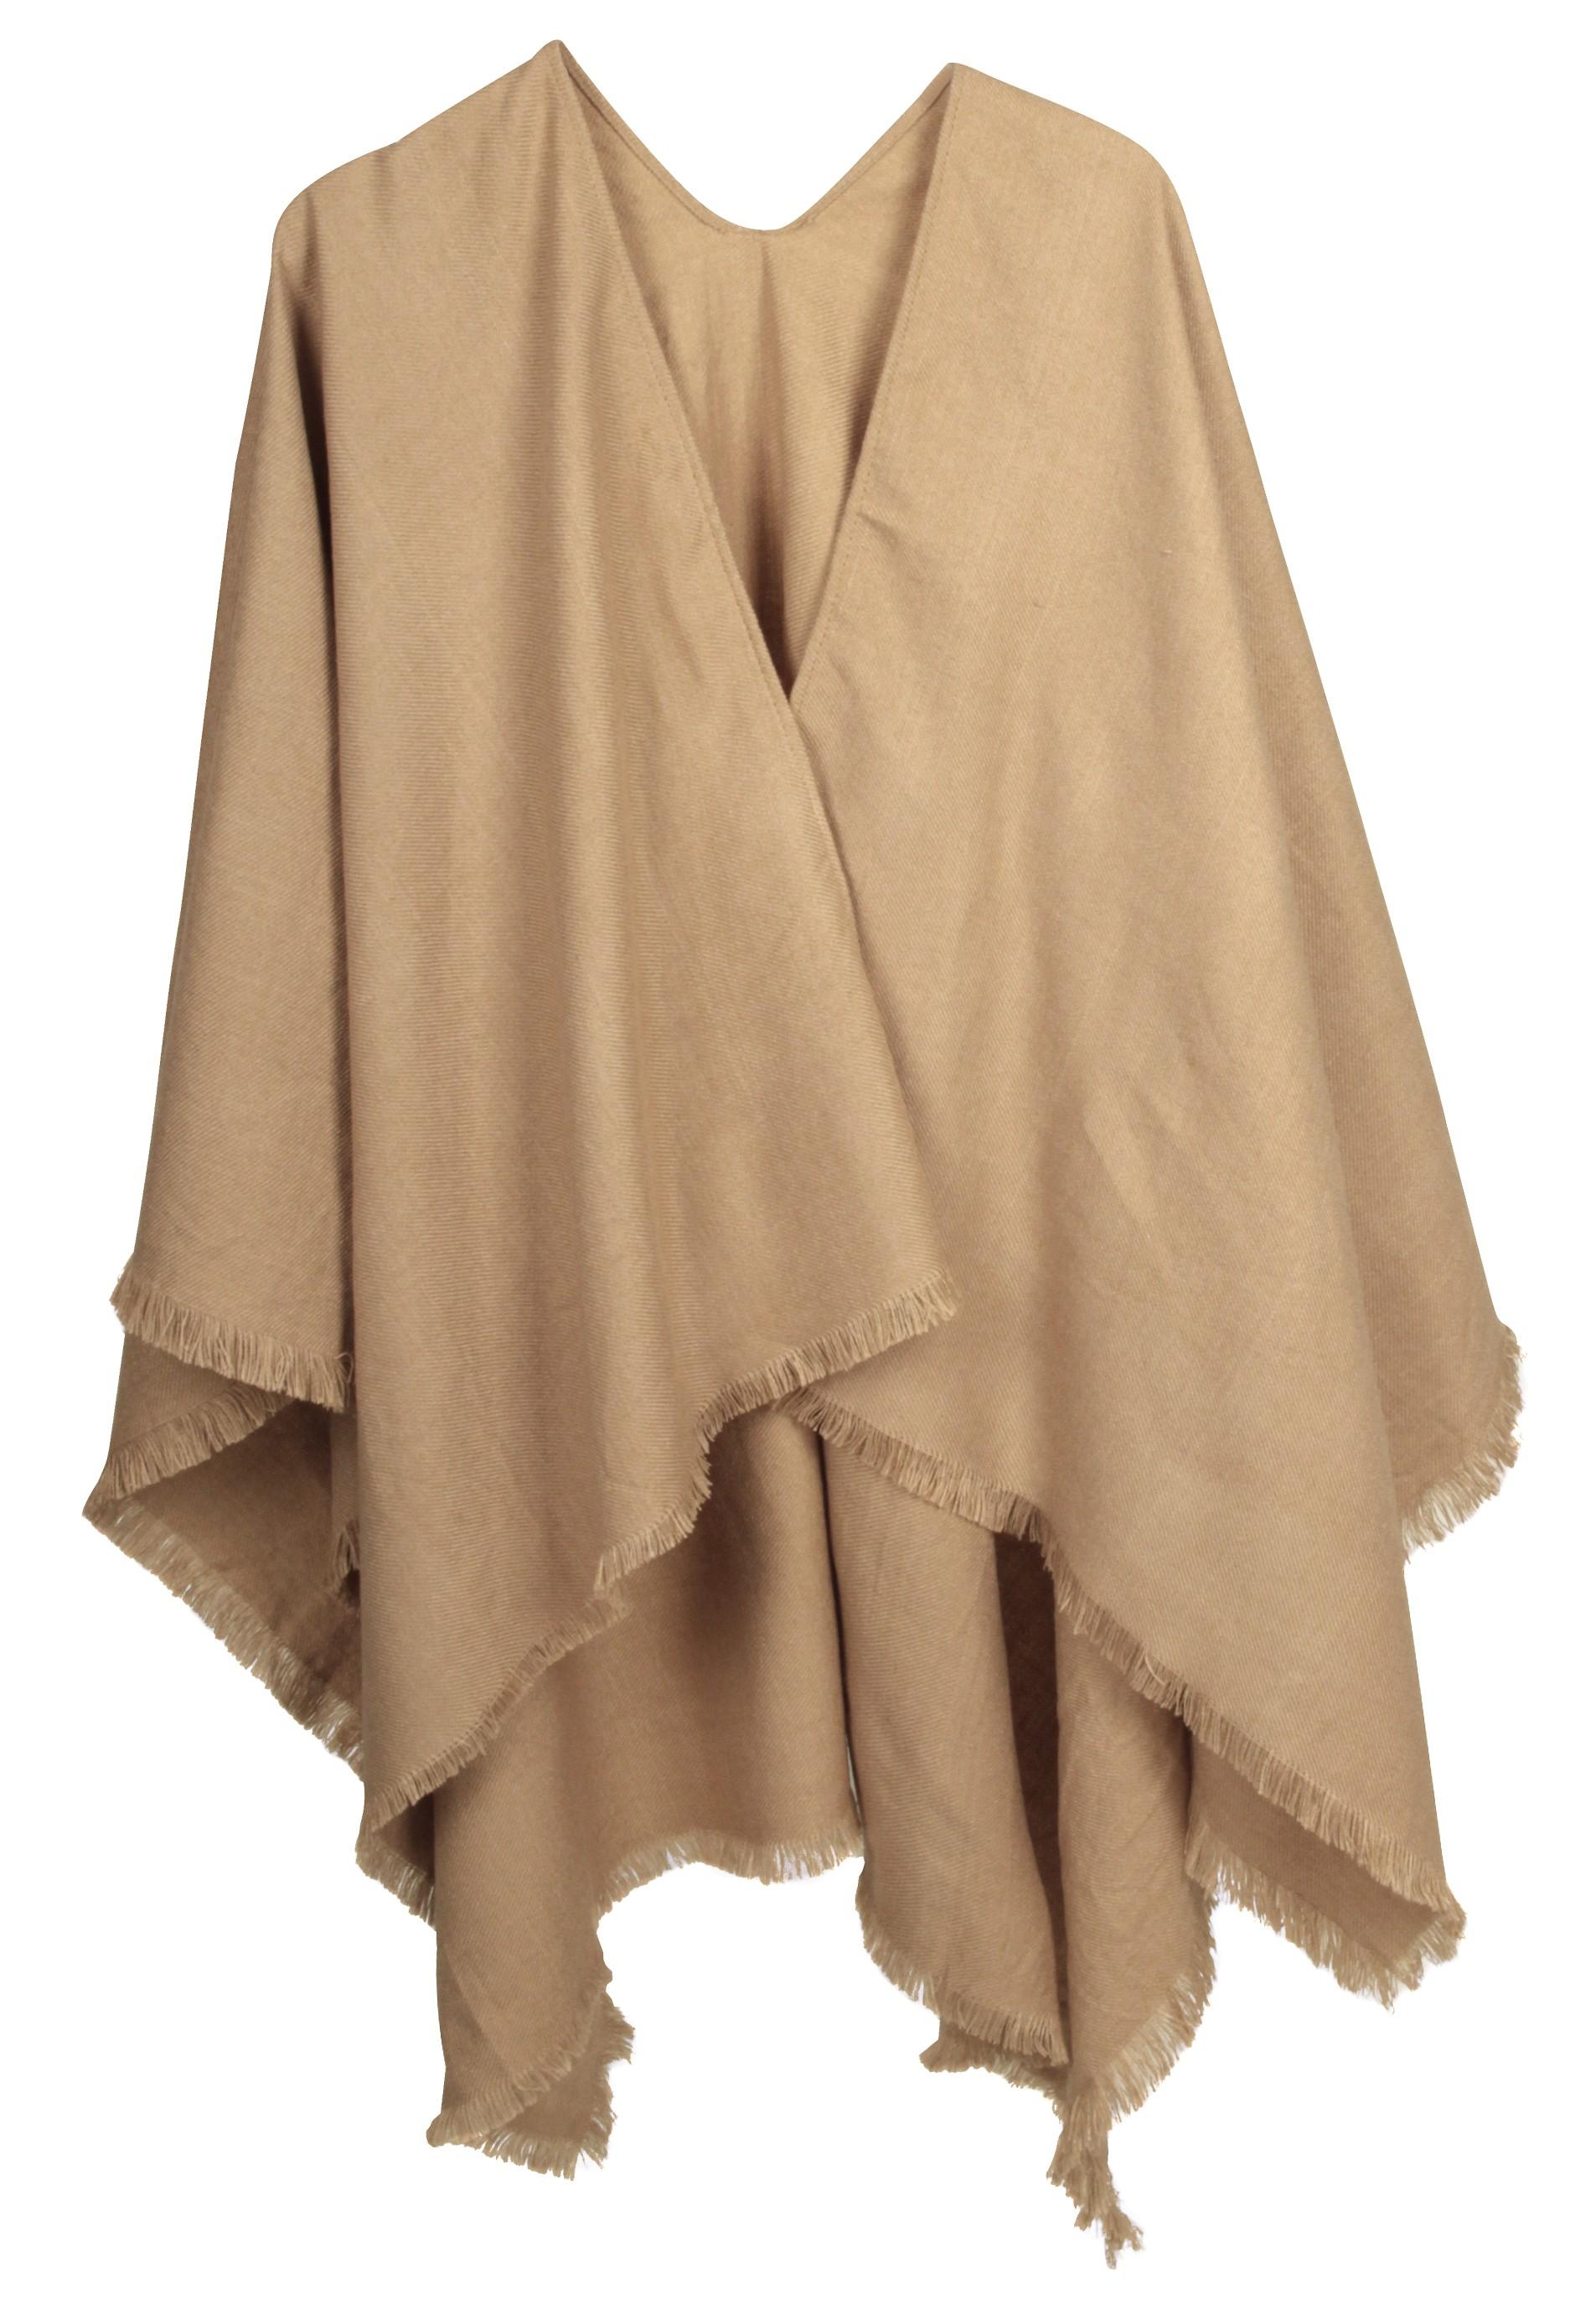 Tolle Ruana in der Trendfarbe Camel